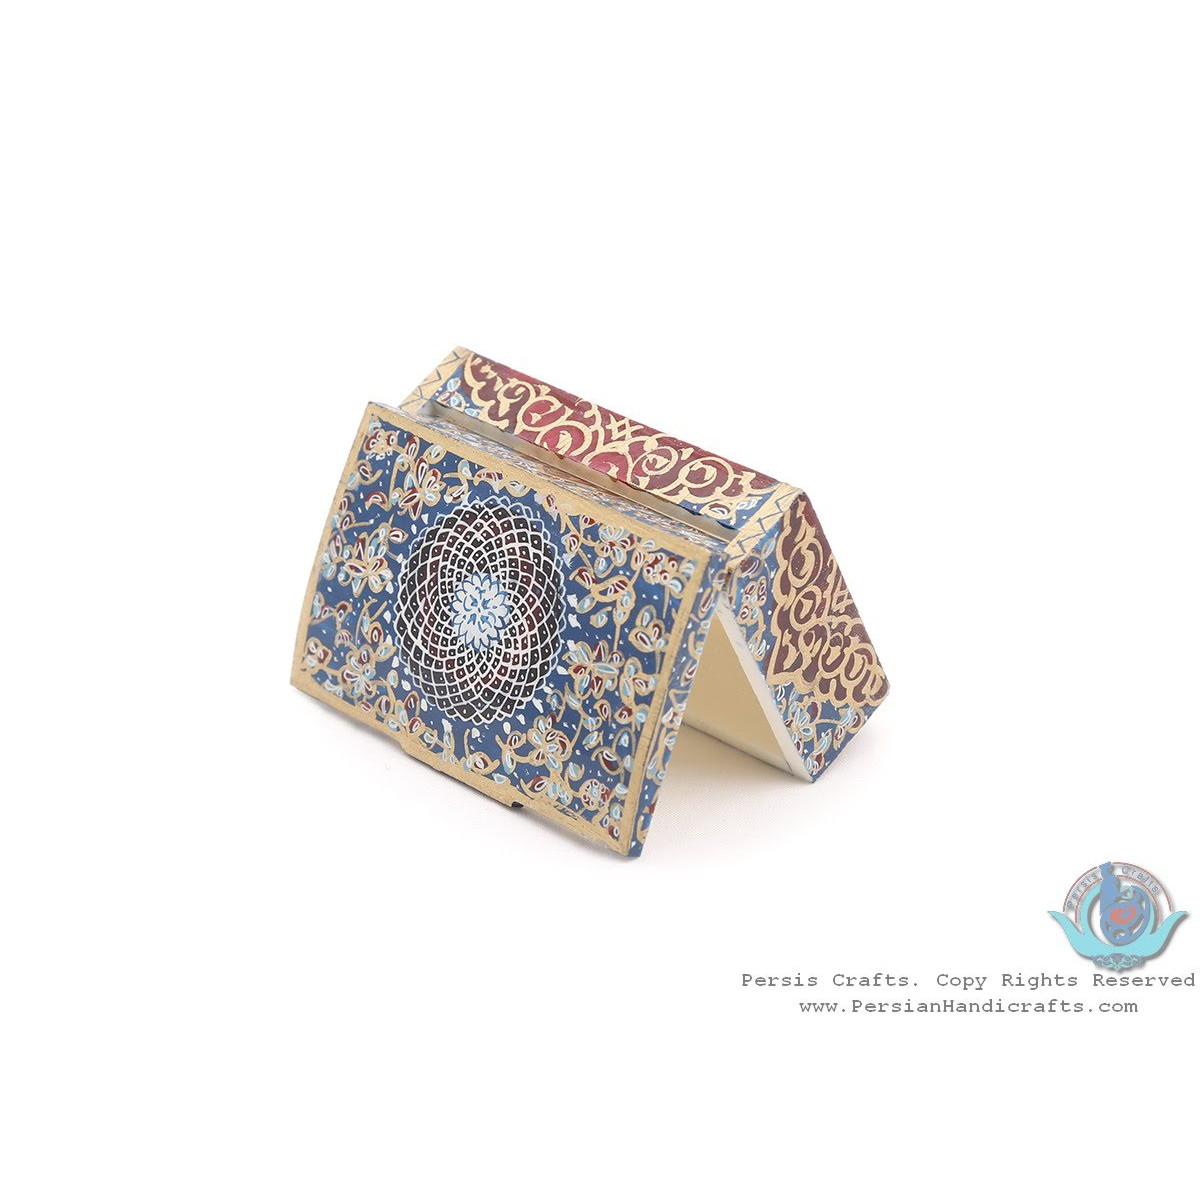 Common Miniature Chest Shape Jewelry Box - HM3917-Persian Handicrafts